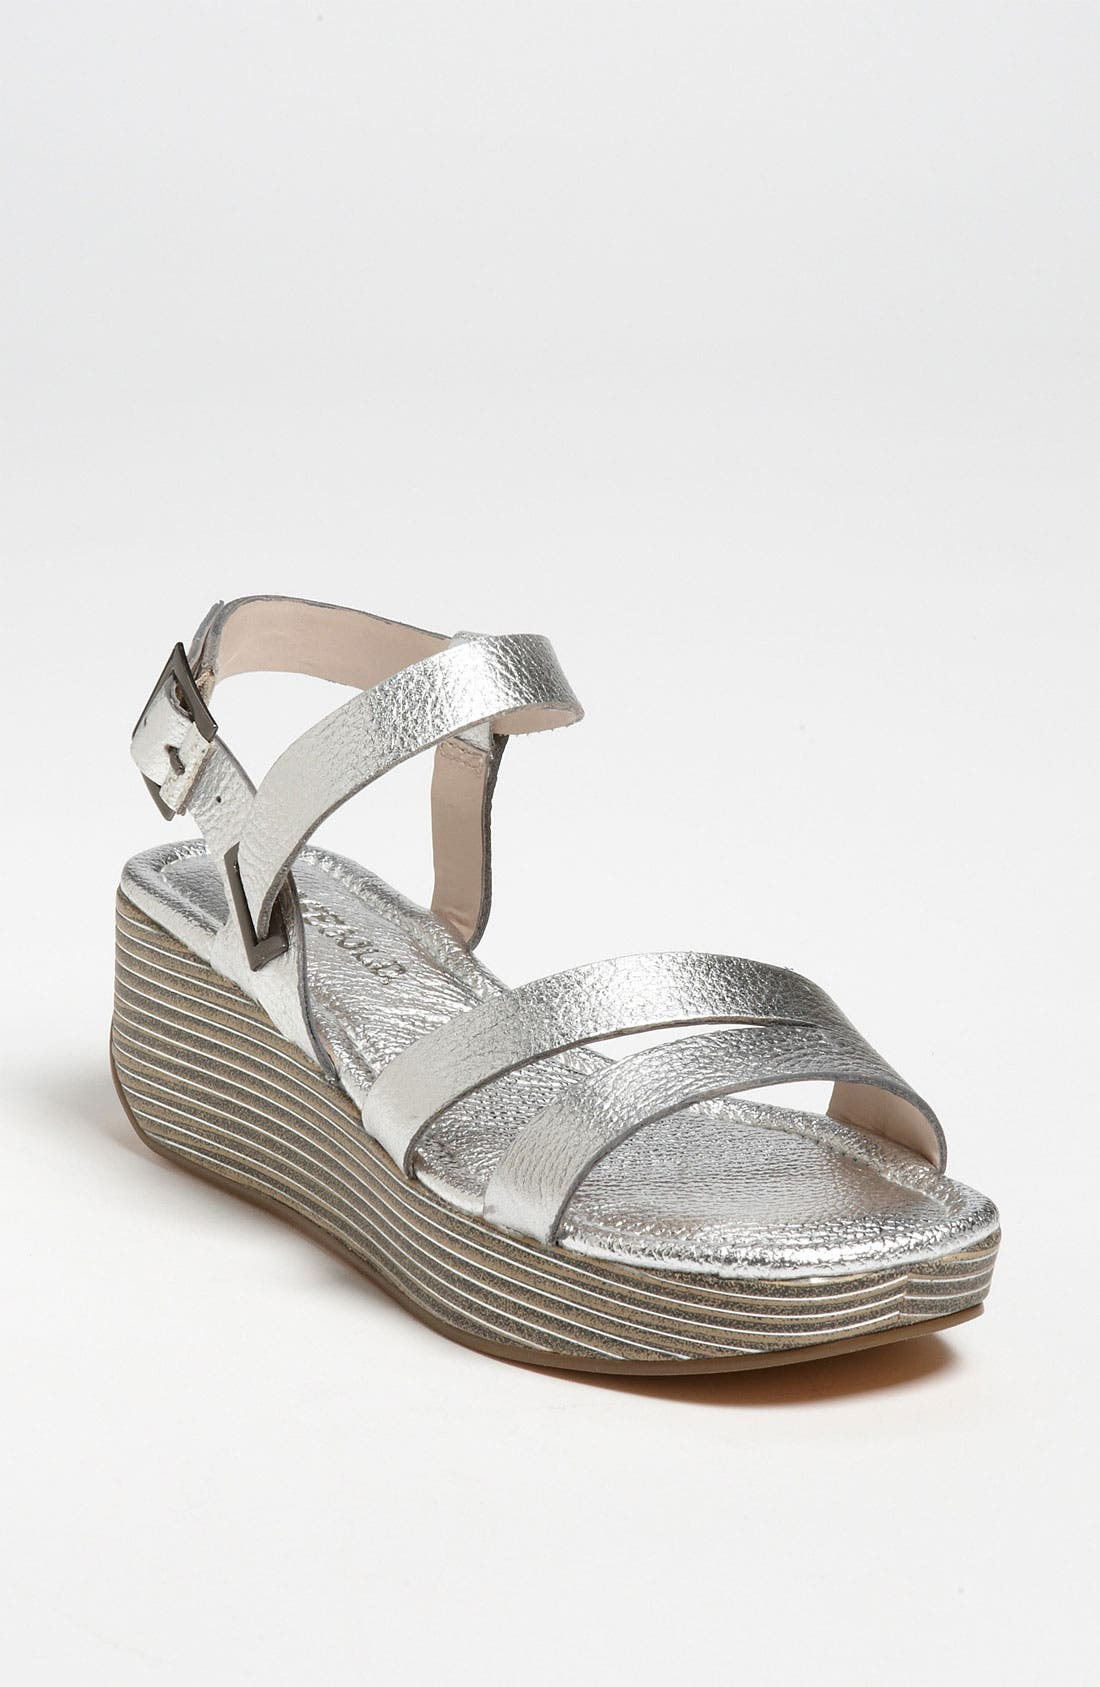 Alternate Image 1 Selected - Rosegold 'Hanna' Sandal